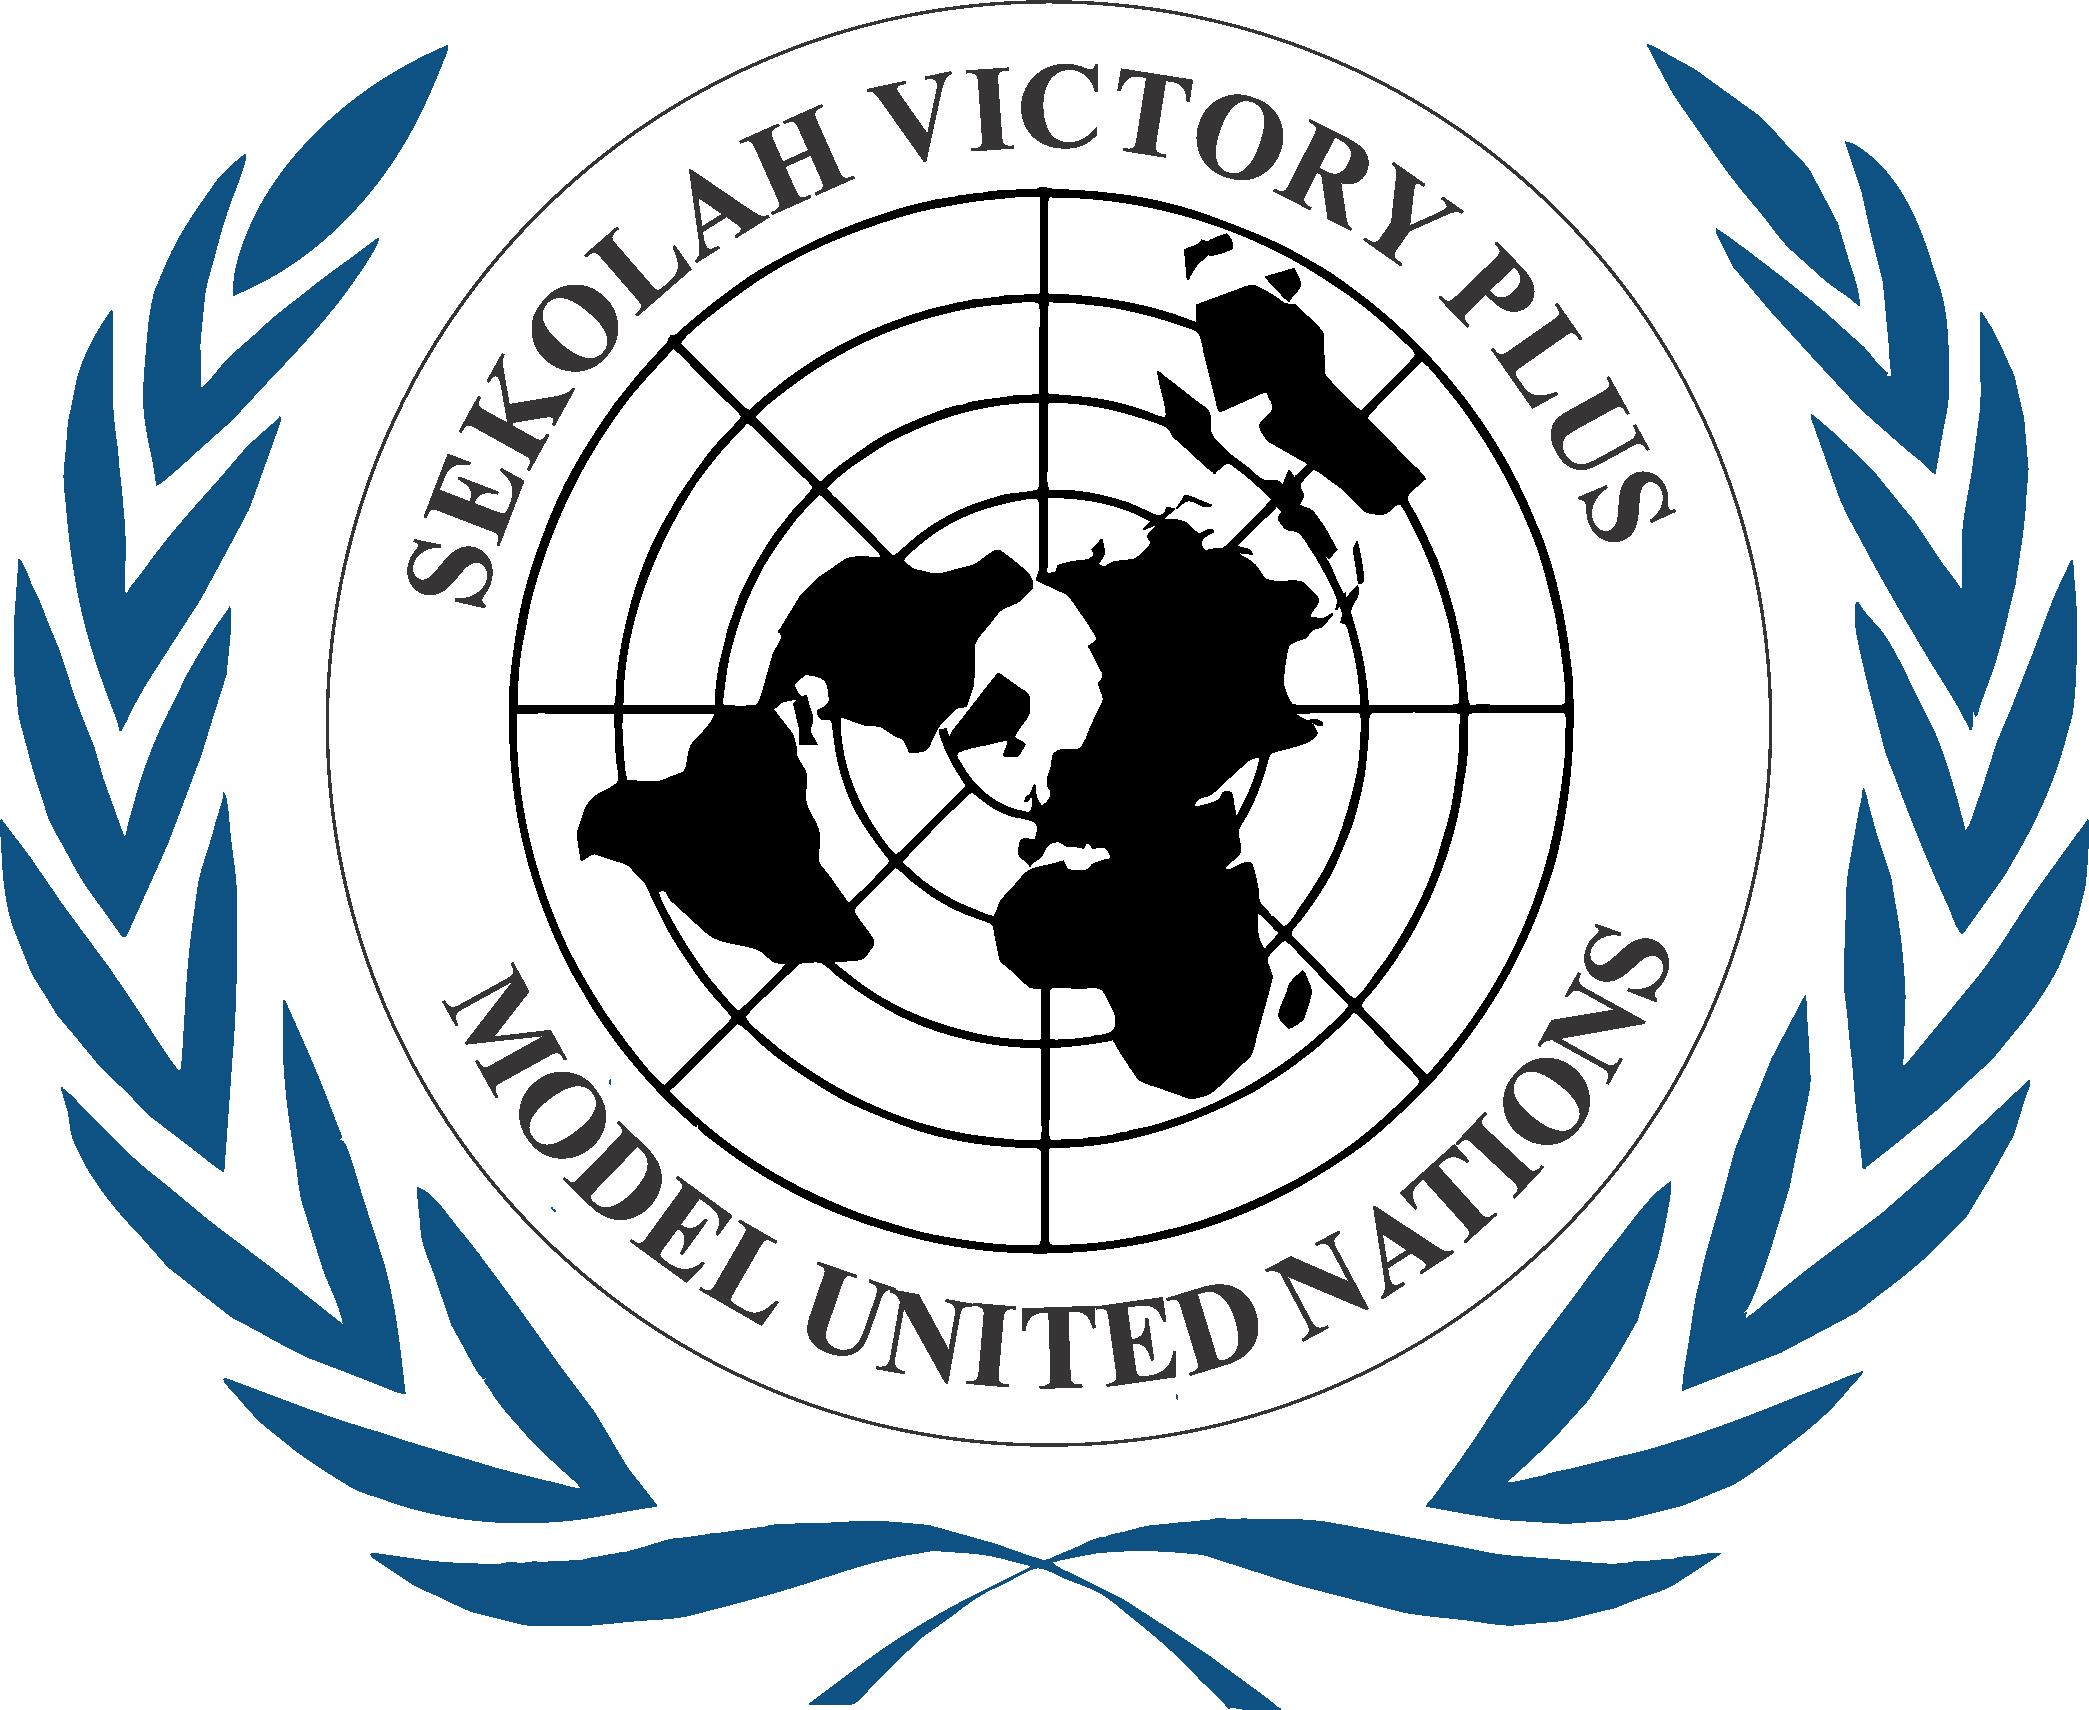 Sekolah Victory Plus.